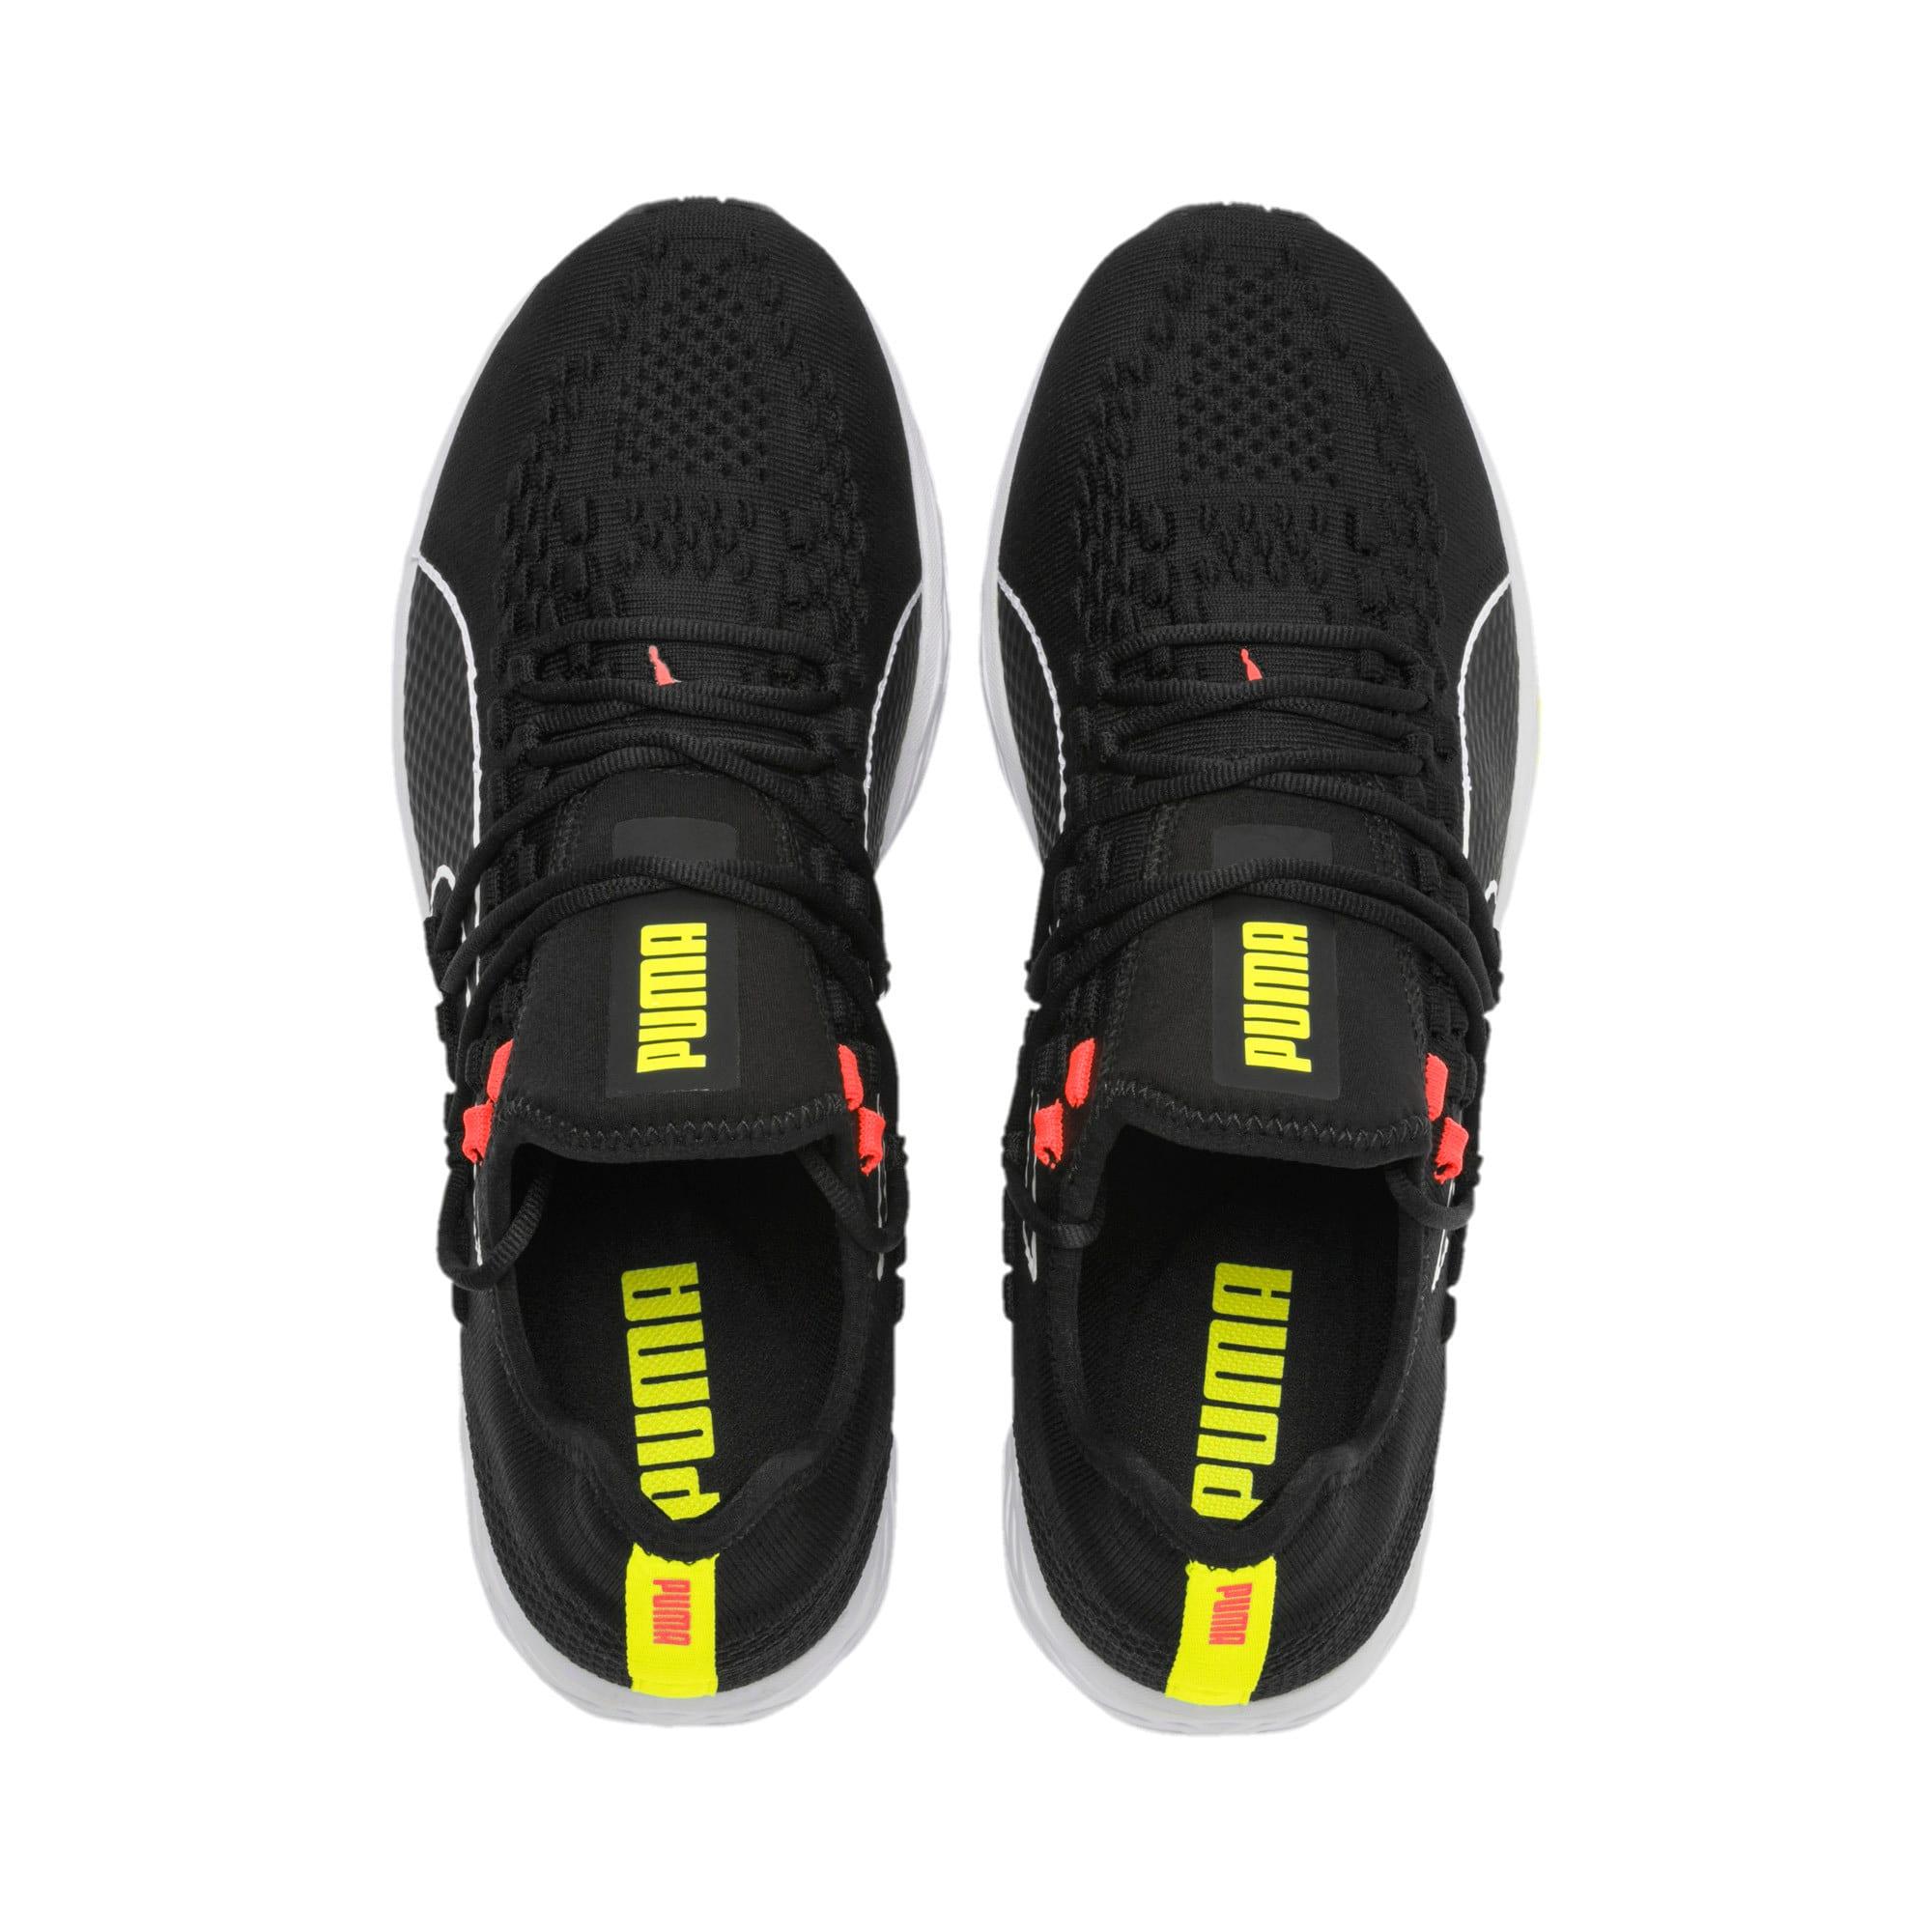 Thumbnail 7 of SPEED RACER Running Shoes, Black-Nrgy Red-Yellow Alert, medium